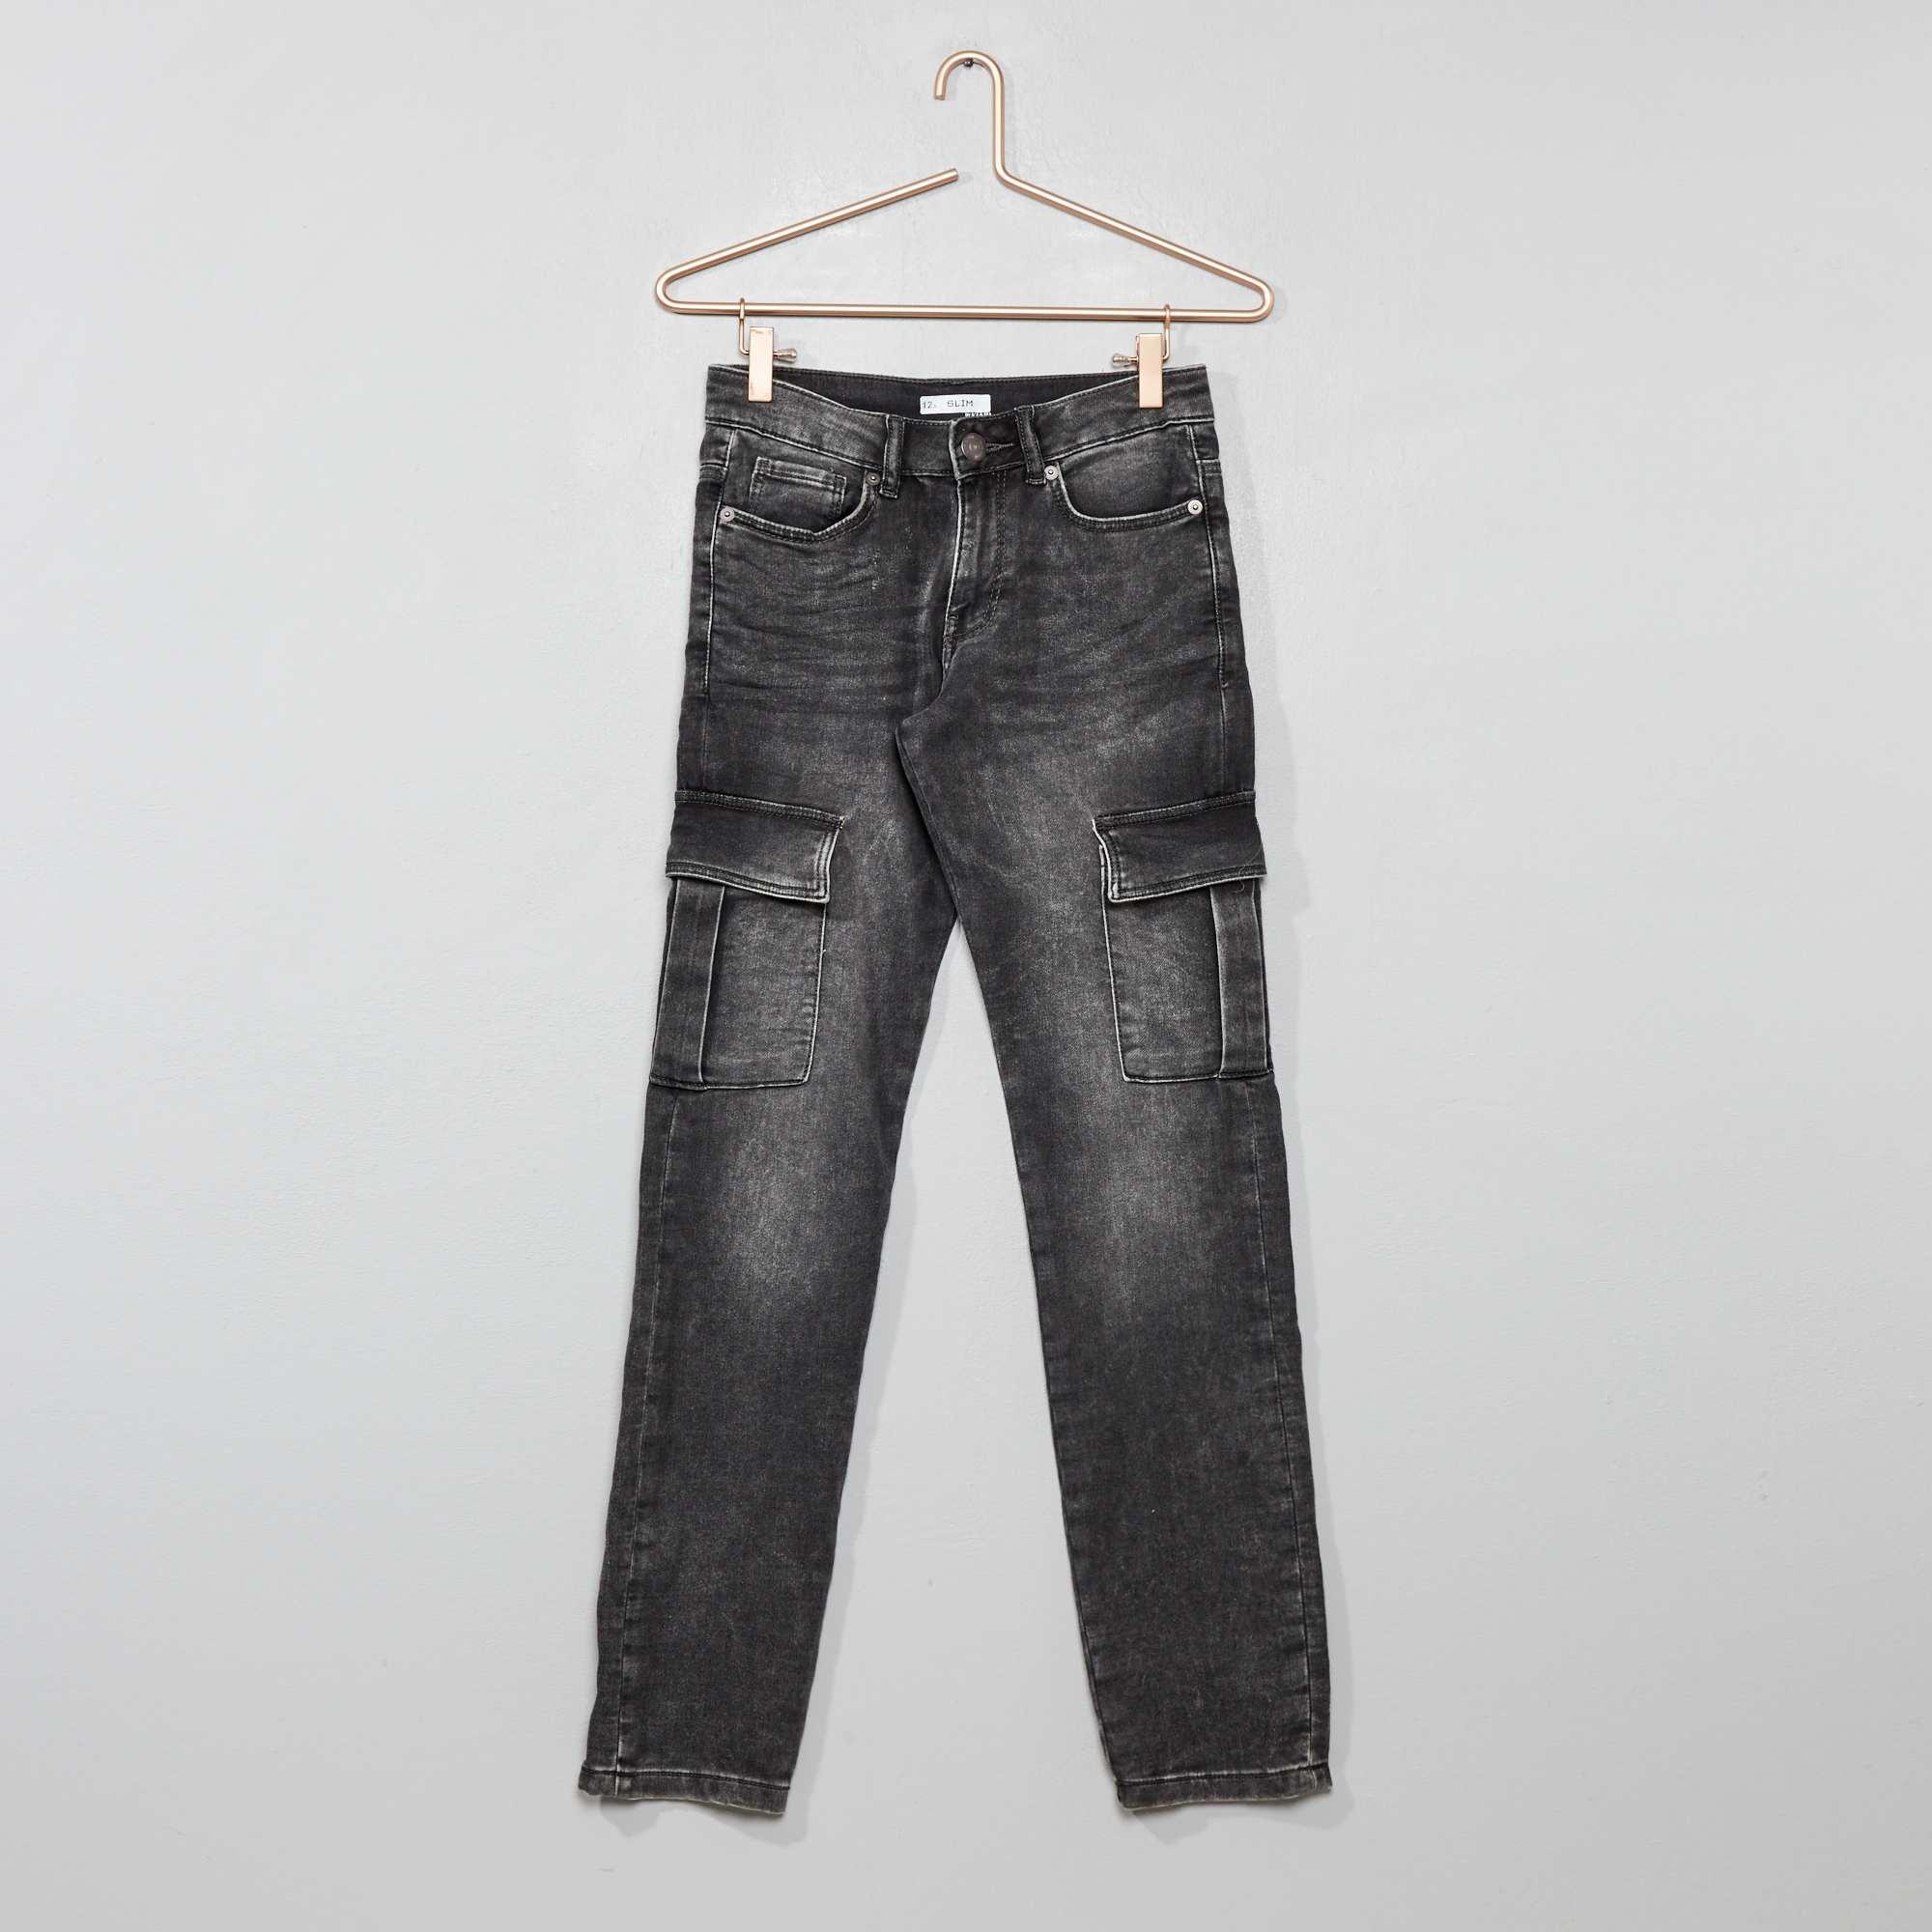 Denim En Stretch Pantalon Slim uFJl3K1cT